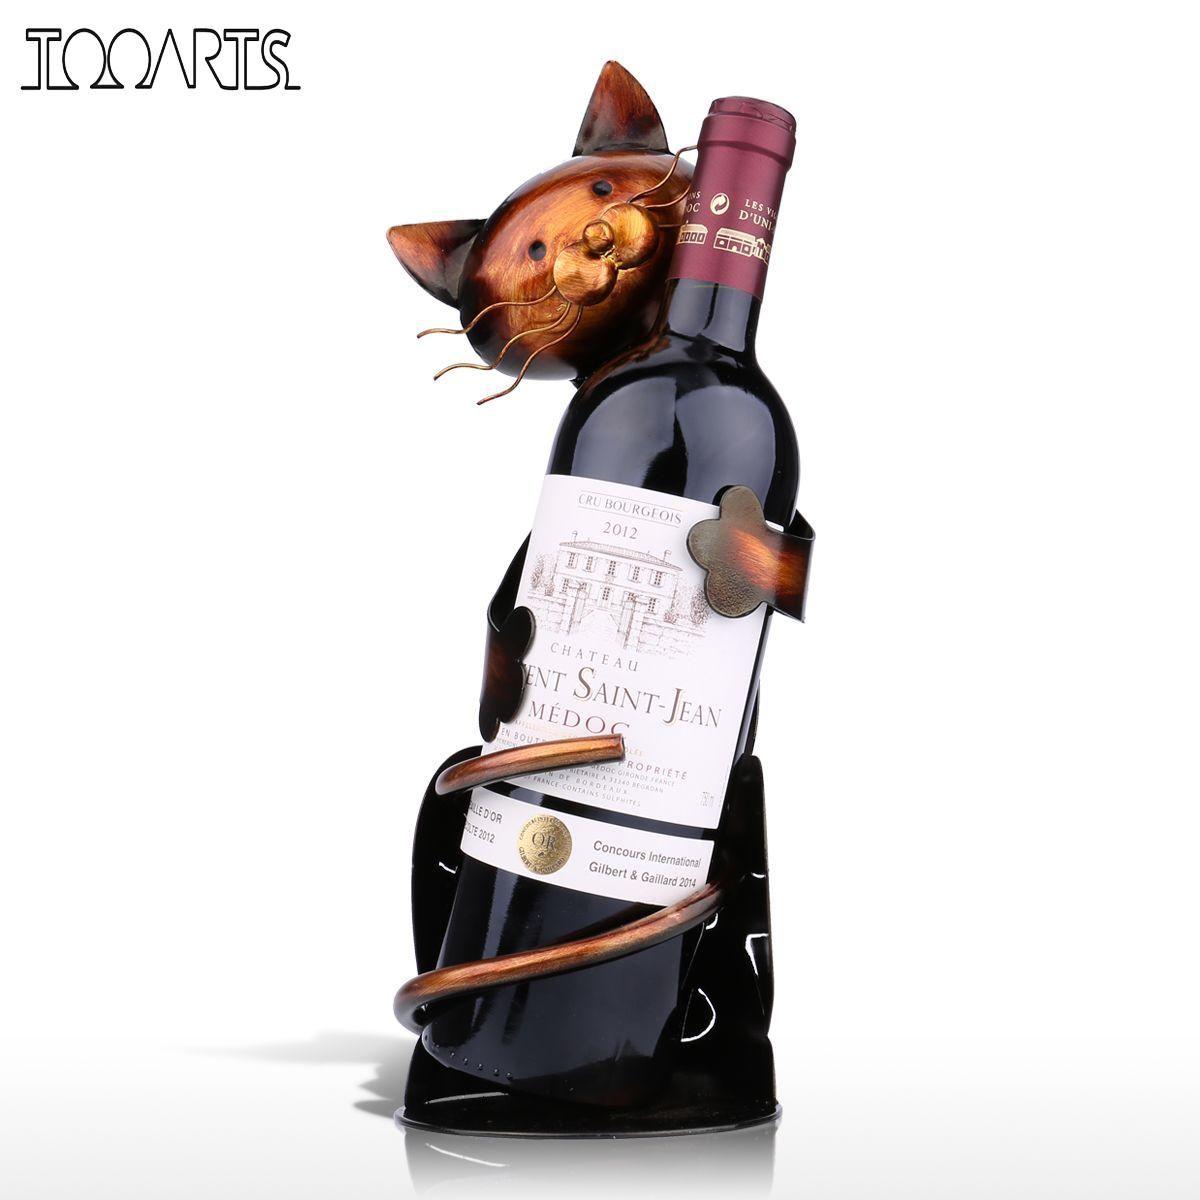 TOOARTS Cat Wine Rack Wine Holder Shelf Metal Practical Sculpture Wine stand Home Decoration Interior Crafts Christmas Gift